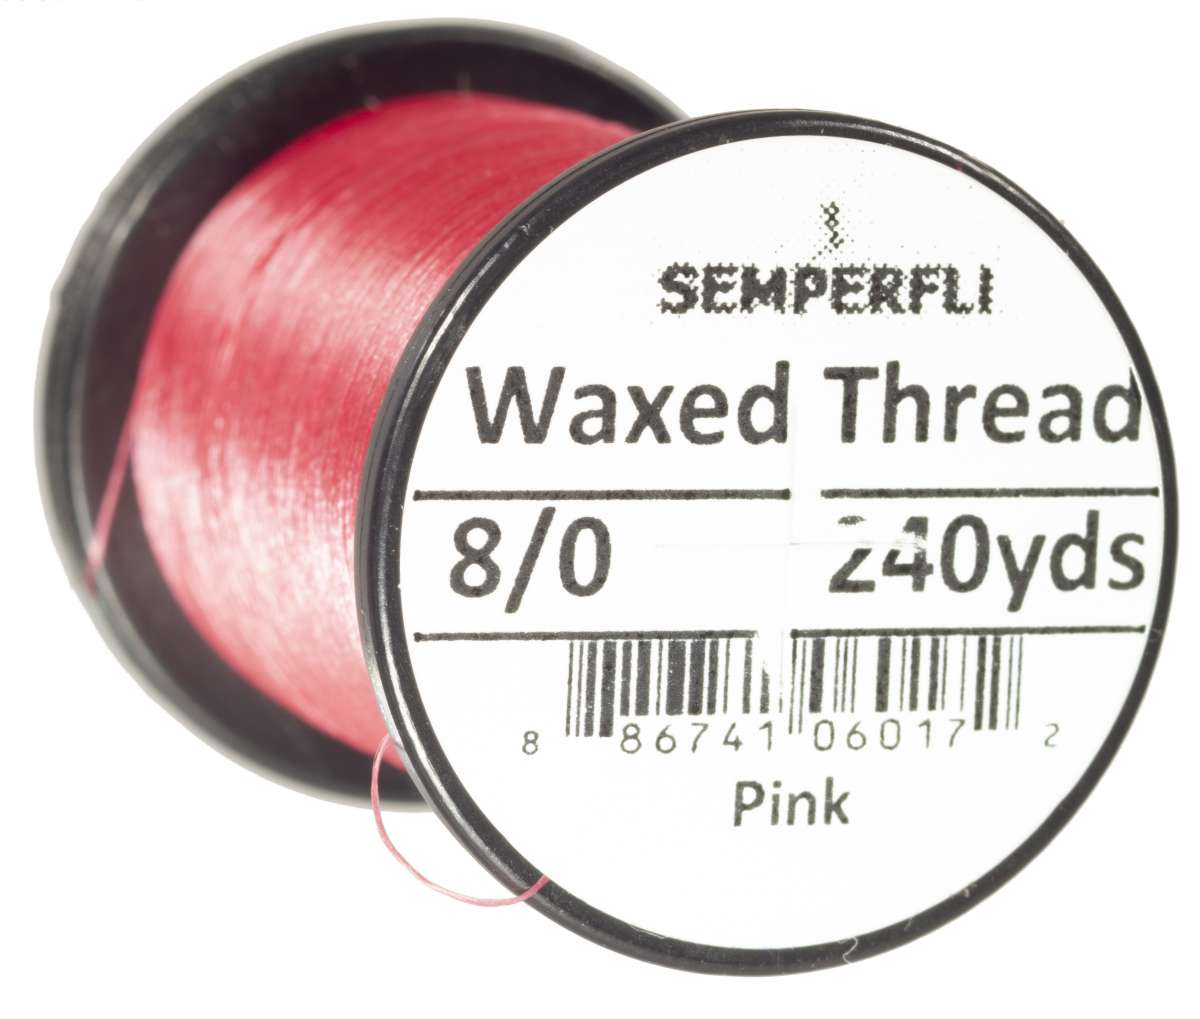 8/0 Classic Waxed Thread Pink Sem-0400-1110